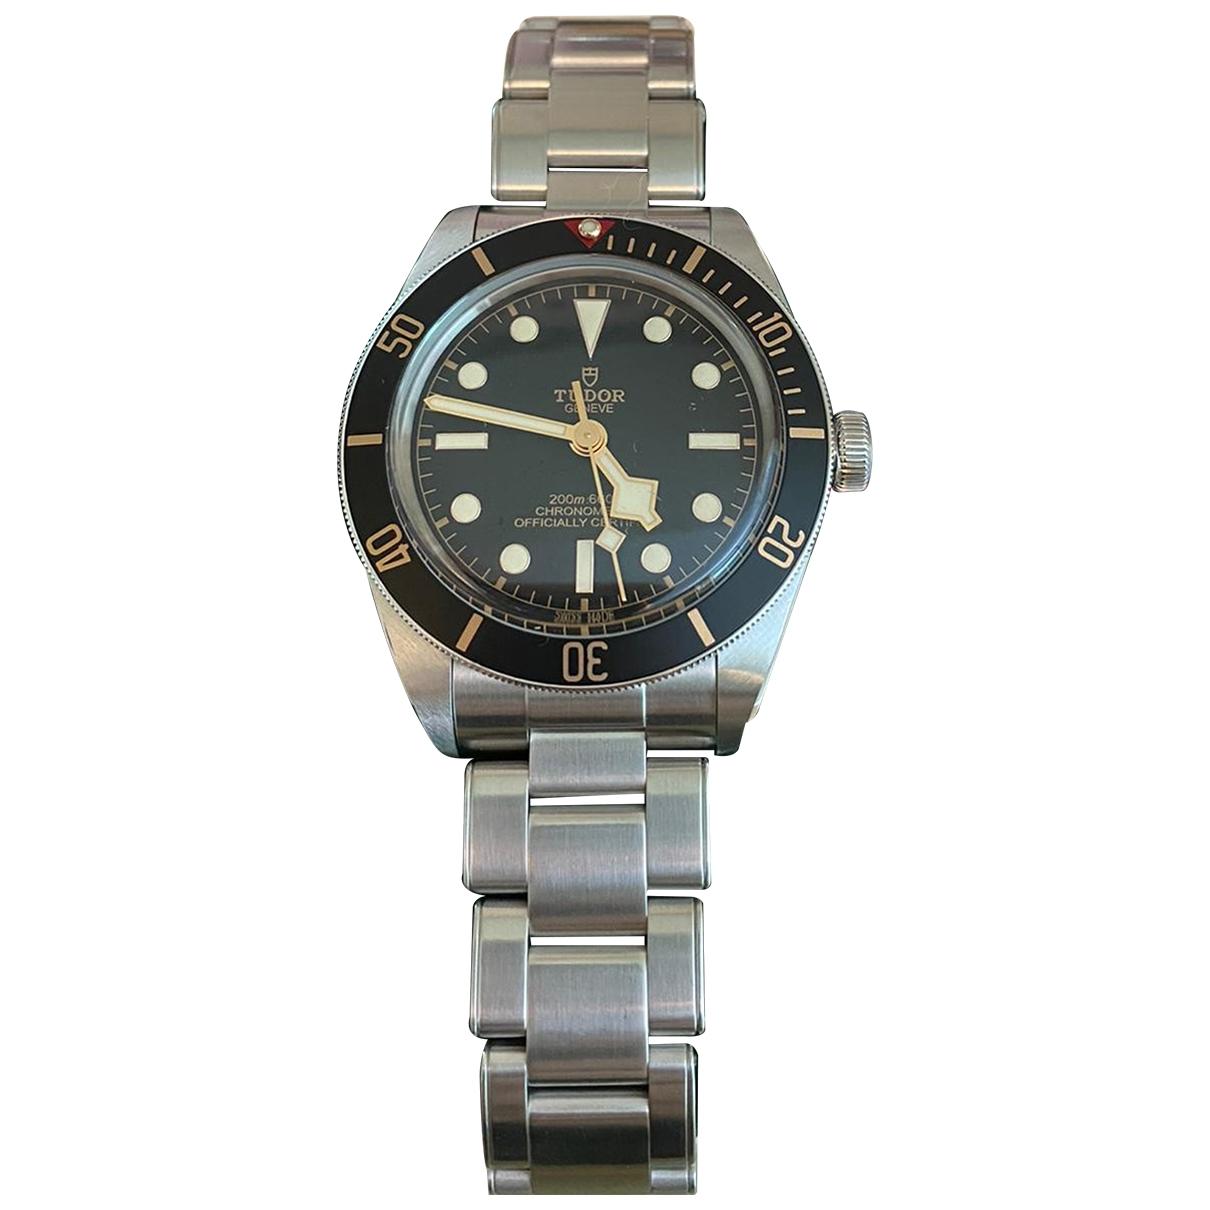 Relojes Black Bay 41mm Tudor